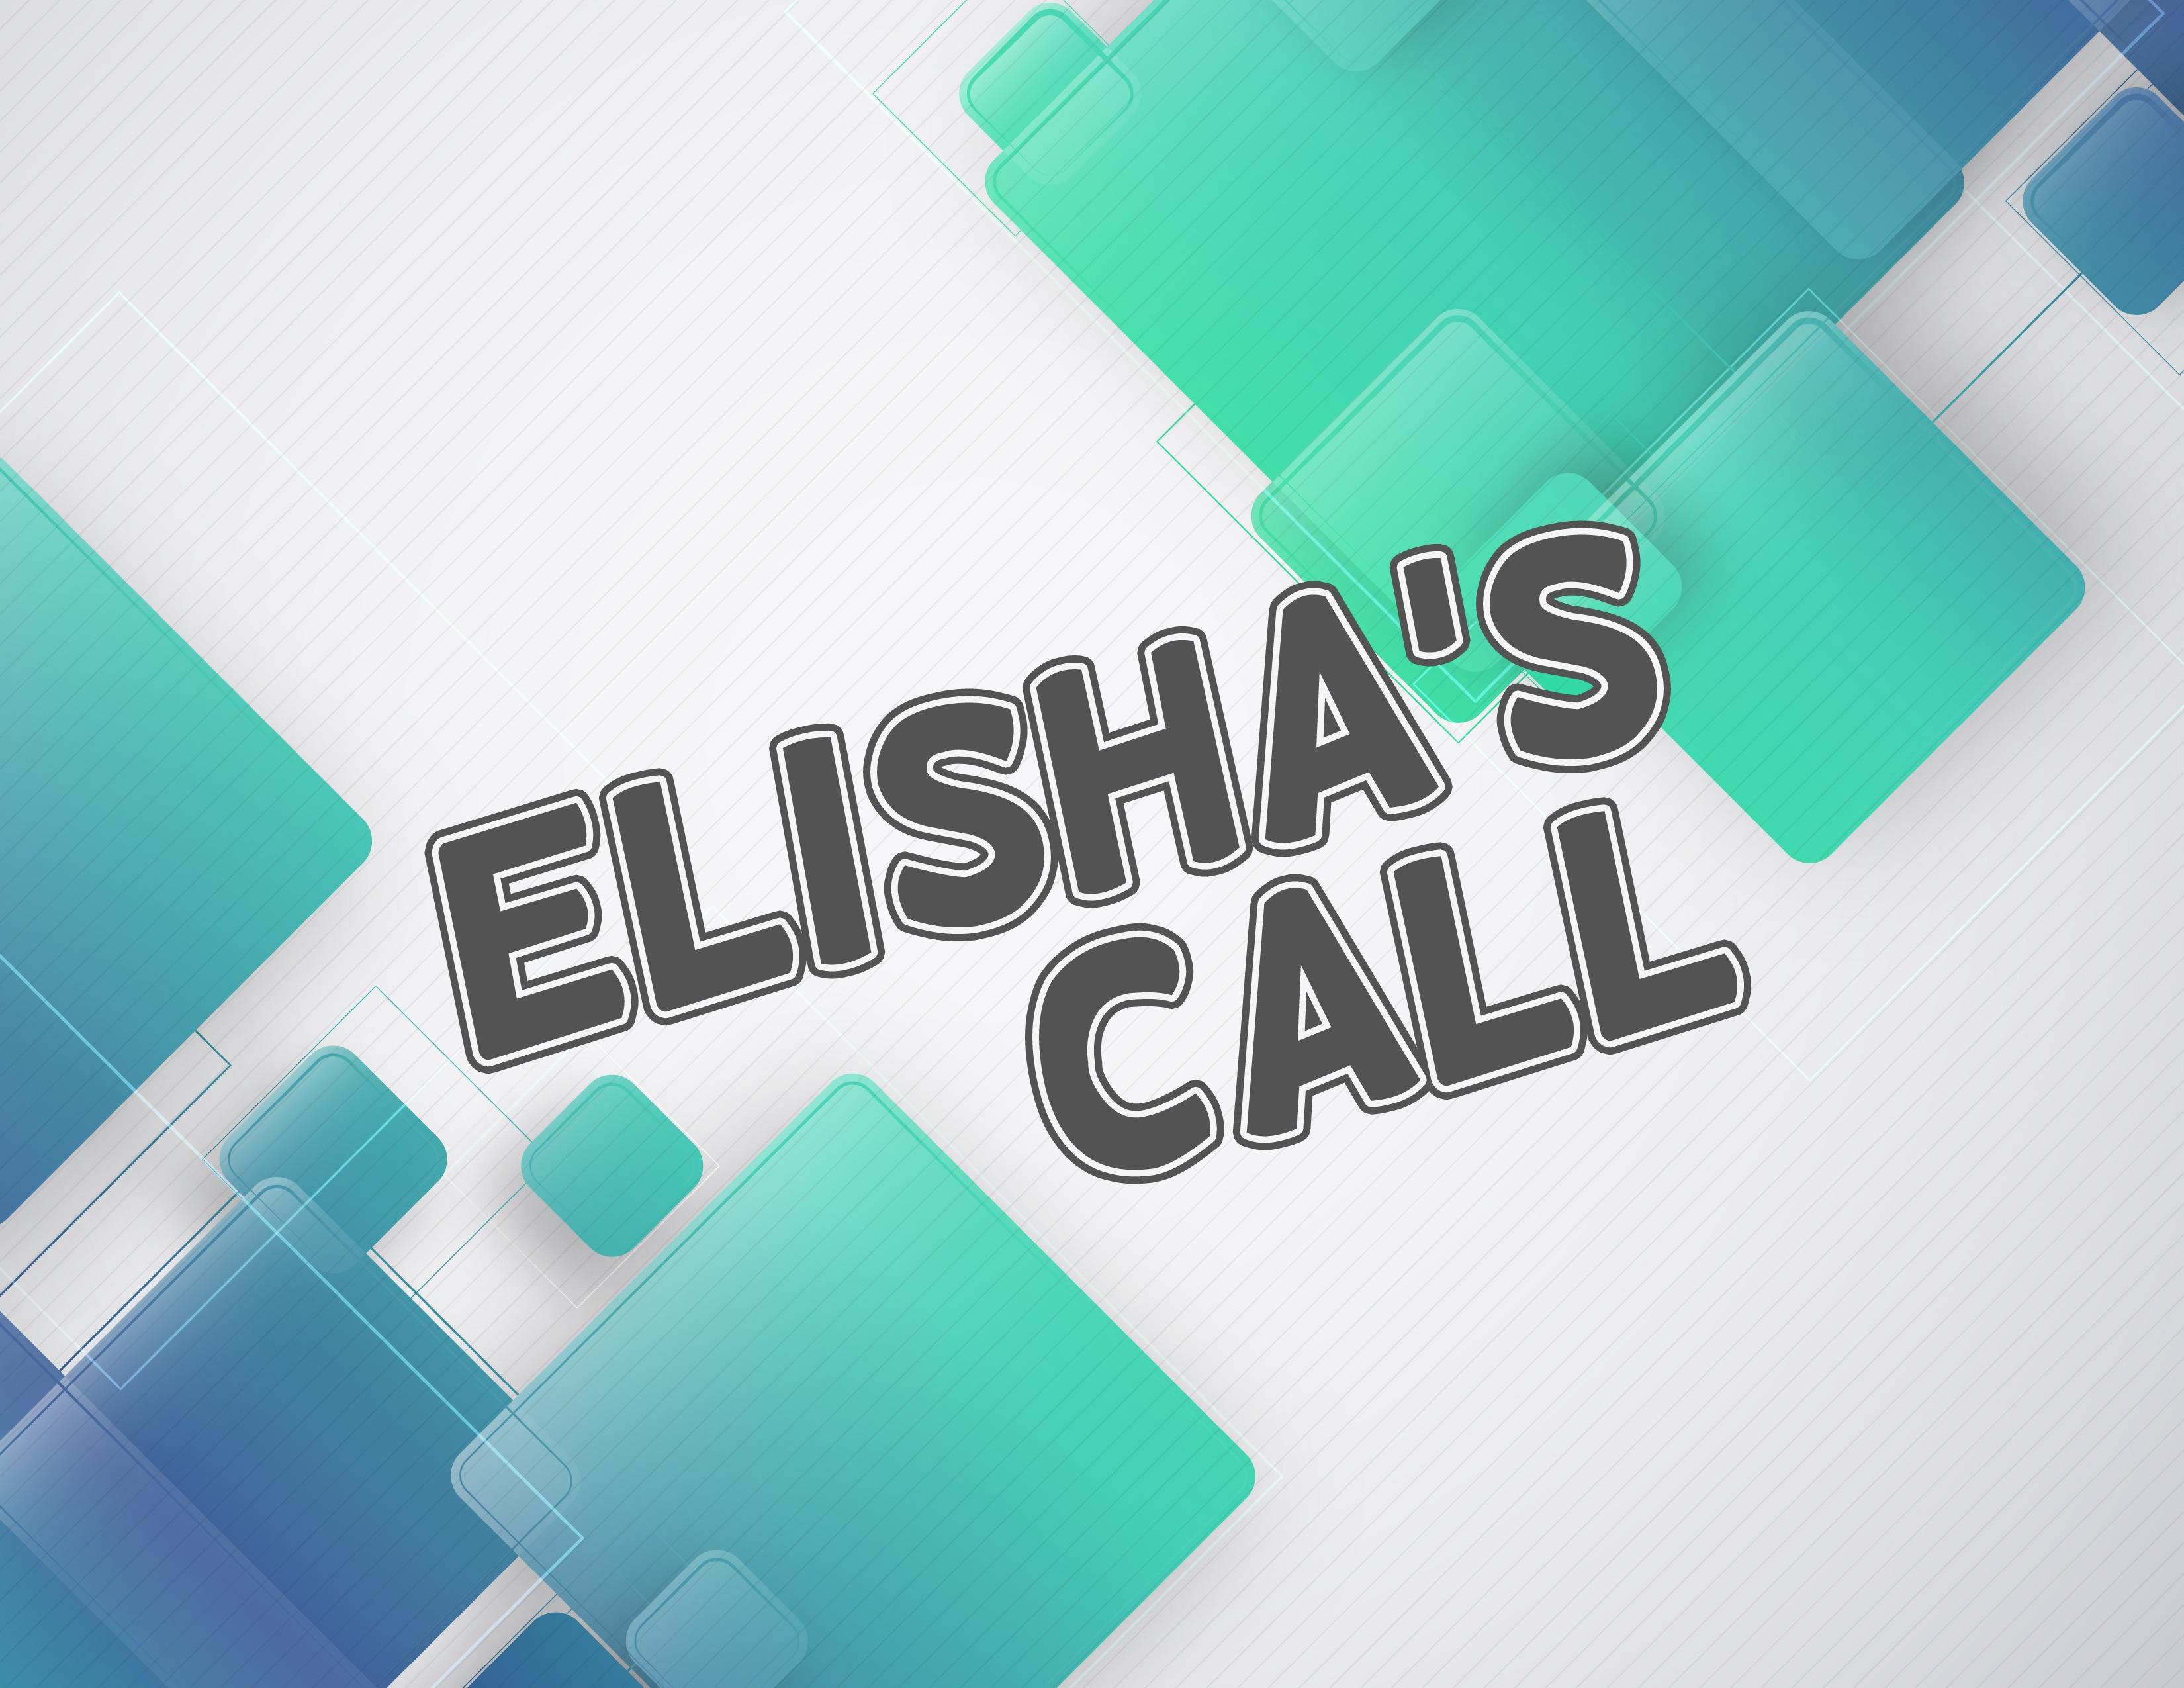 Elisha S Call Sunday School Lesson 1 Kings 19 19 21